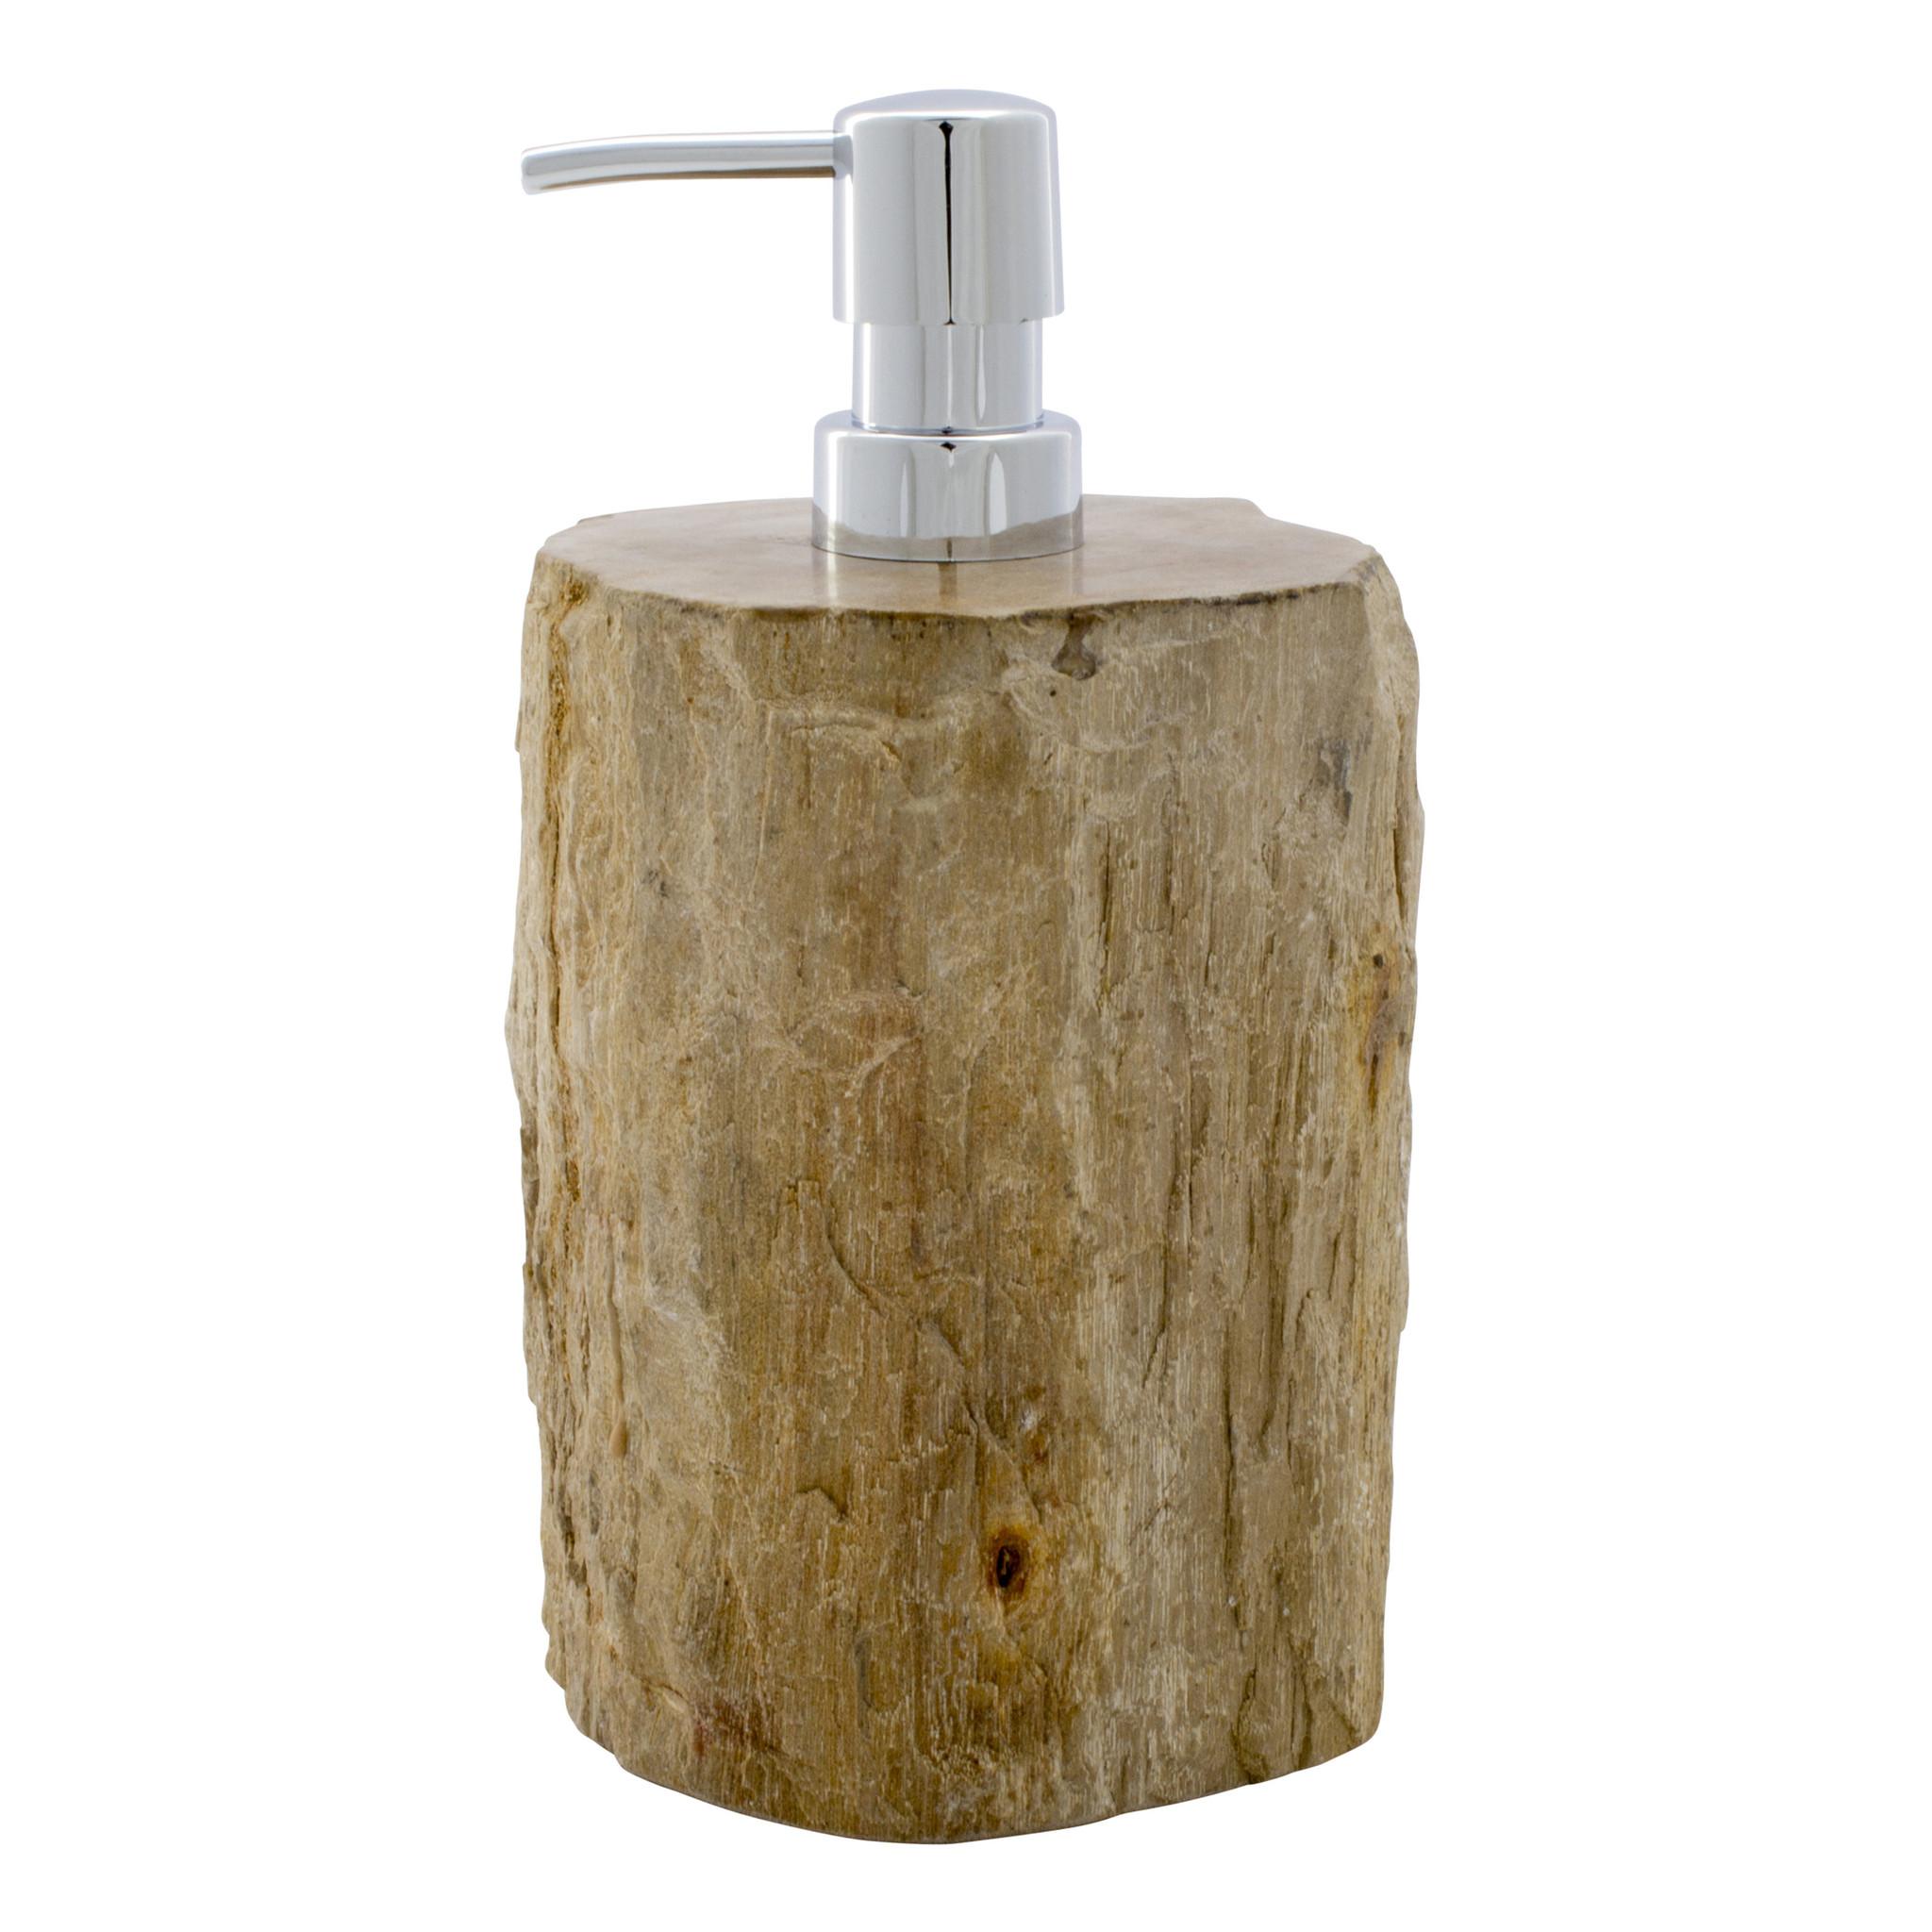 Indomarmer 4-Teilige Versteinertes Holz Badeset Liana